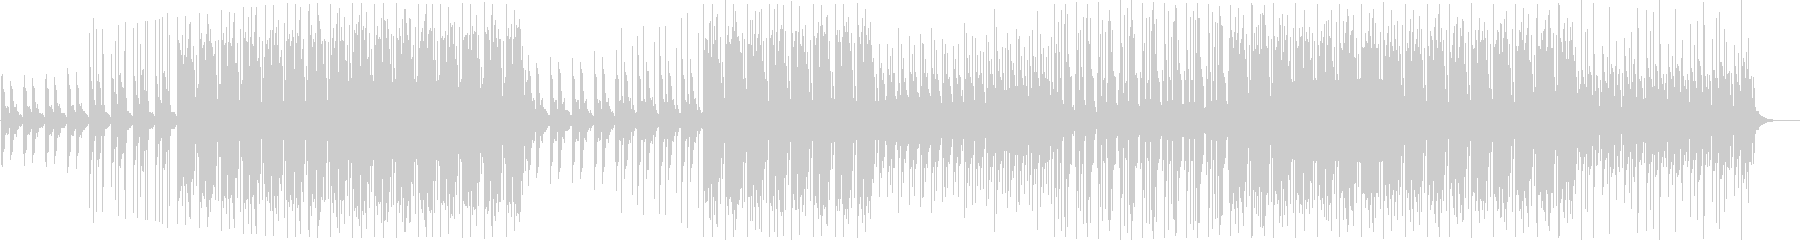 TikTok YouTube明るいBGMの未再生の波形